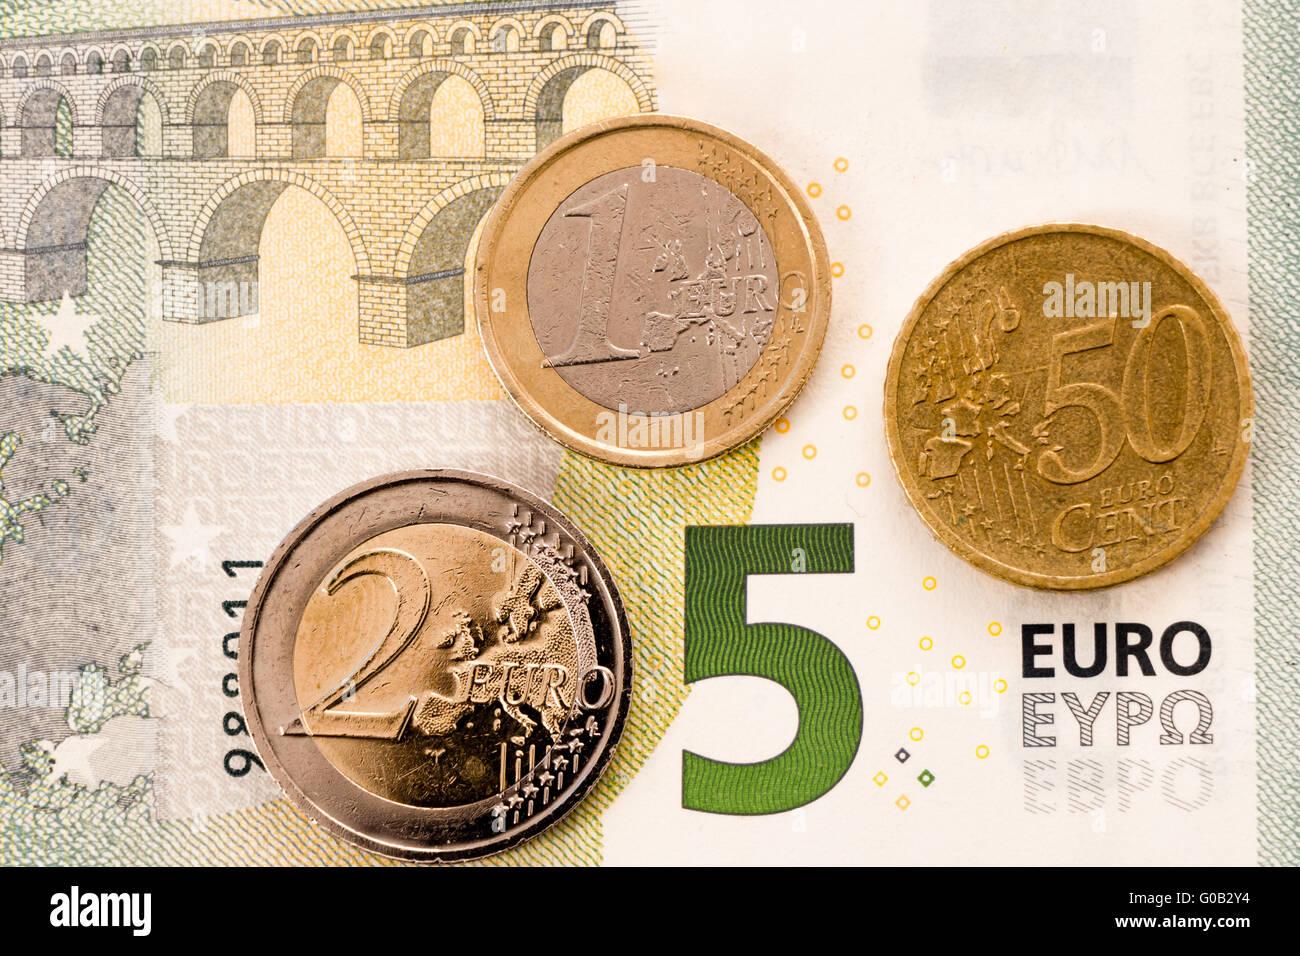 German minimum wage - Stock Image